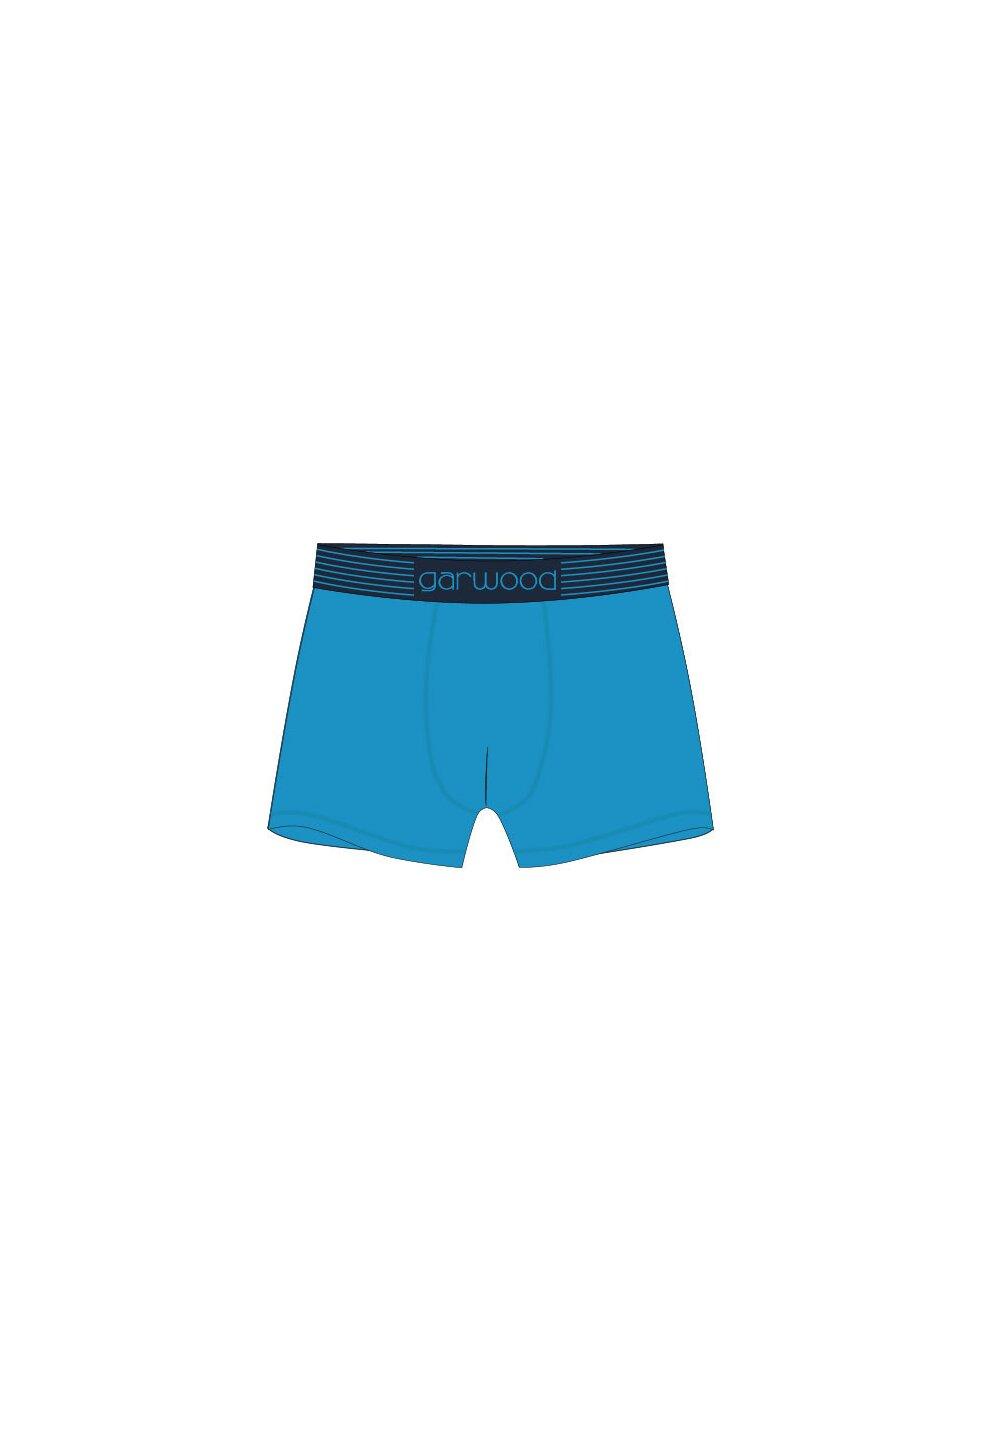 Boxeri baieti, Grawood, albastri imagine